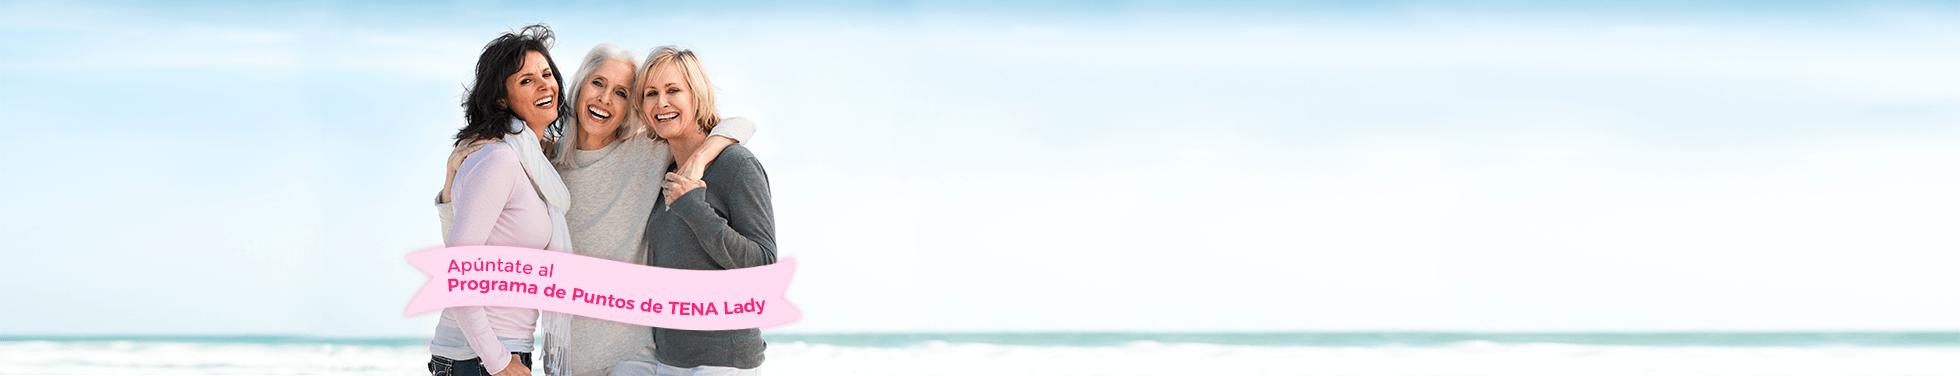 1960x376-three-women-beach-loyalty-spain.png